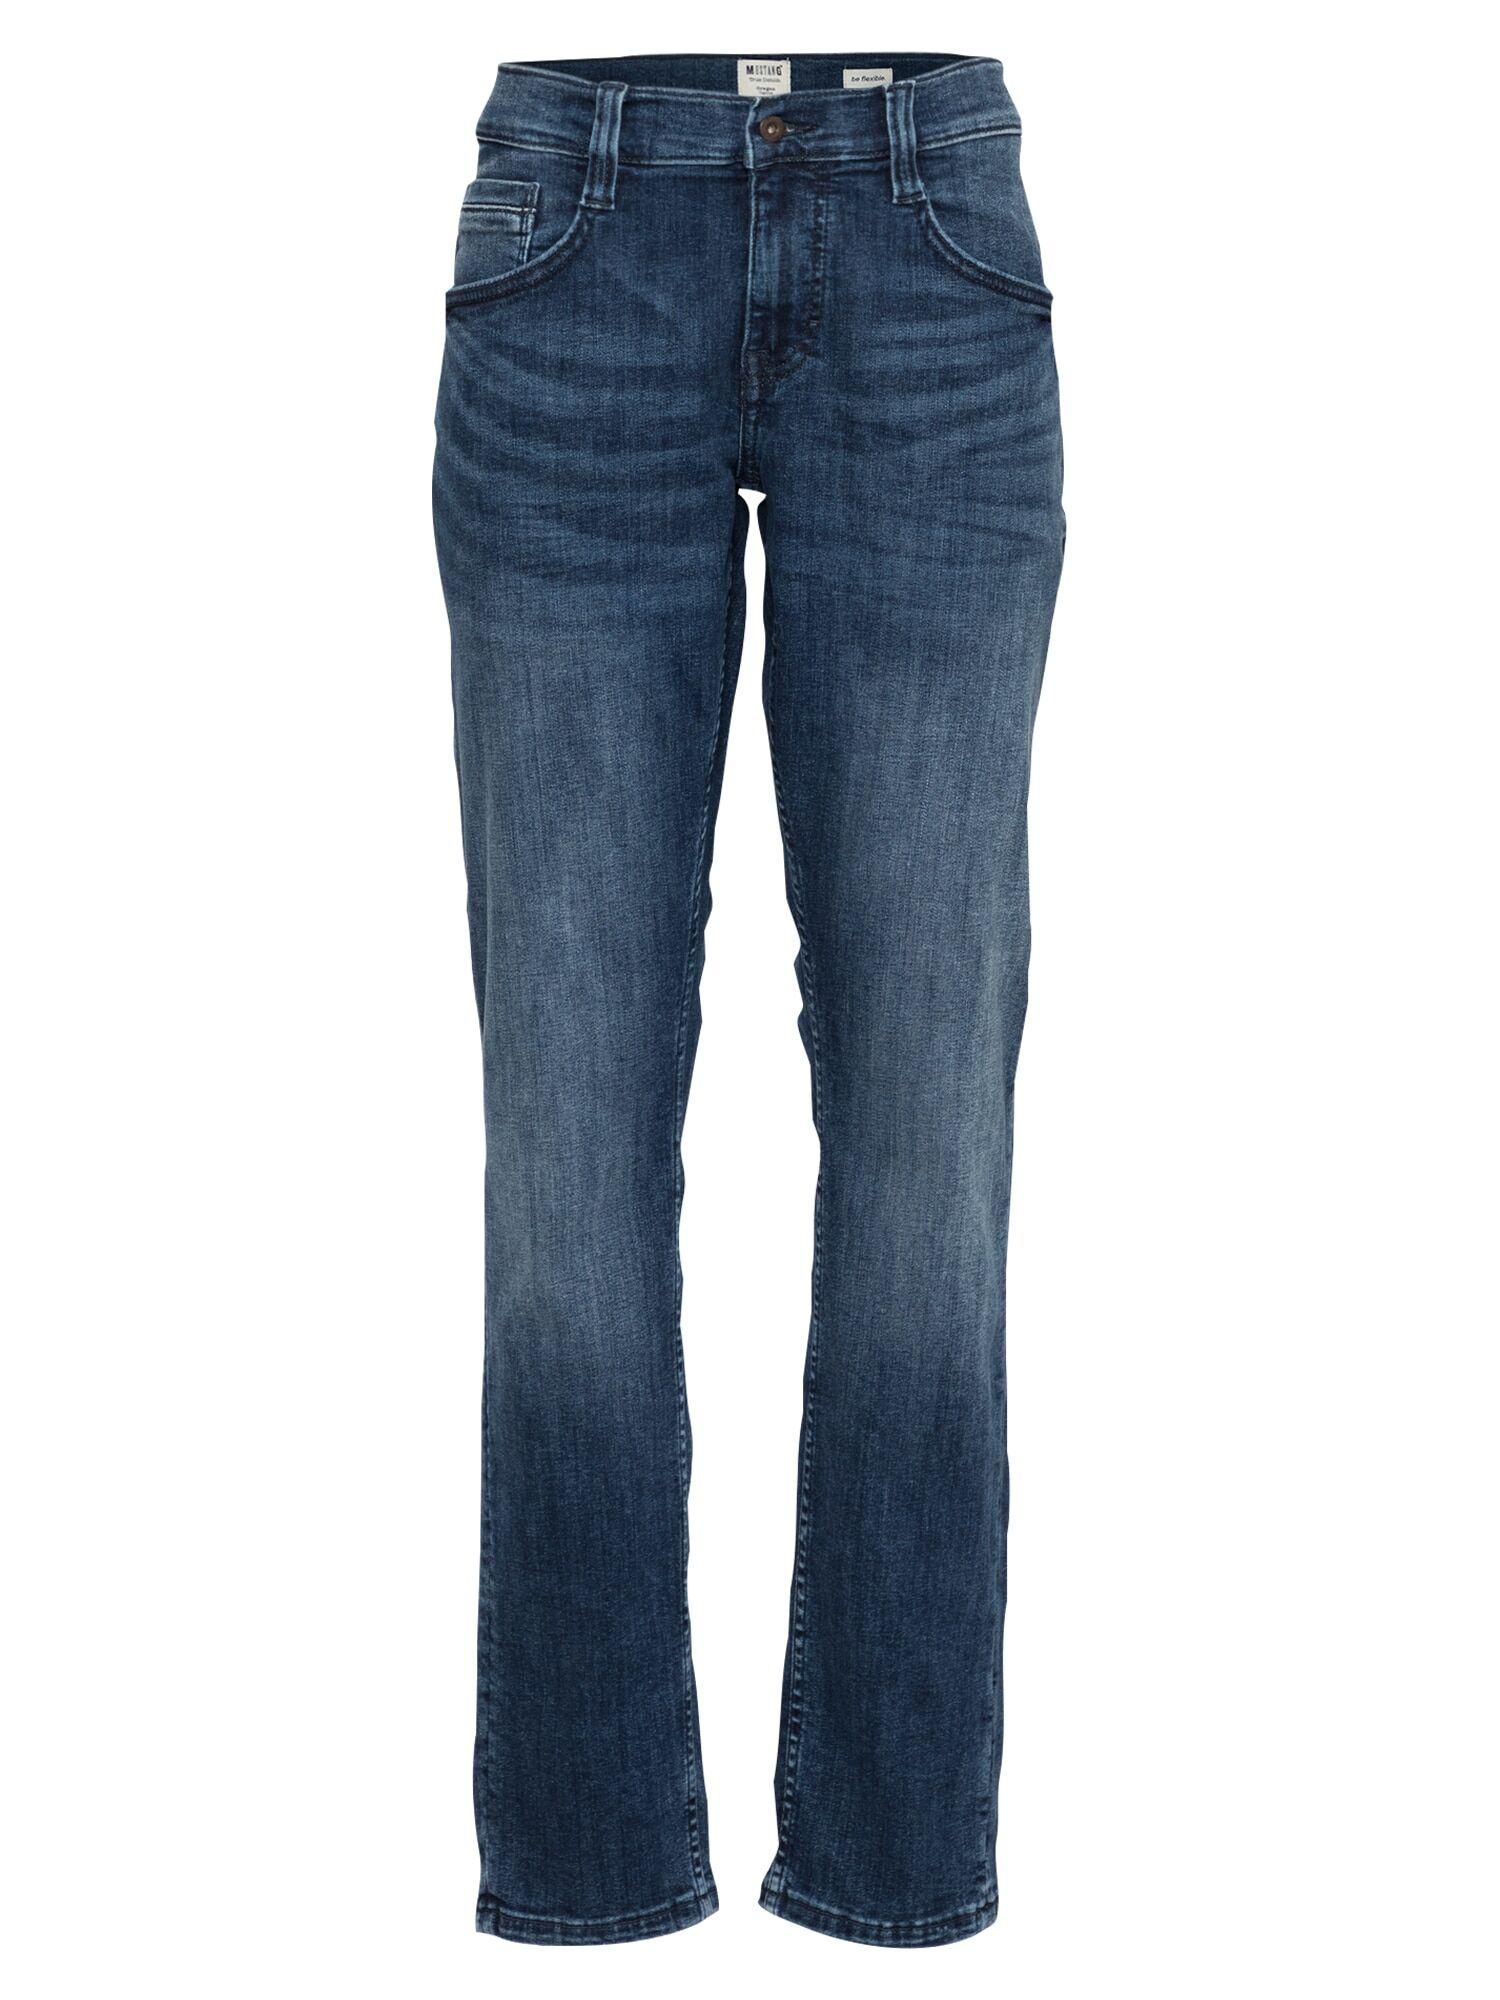 MUSTANG Jean 'Oregon'  - Bleu - Taille: 31/34 - male